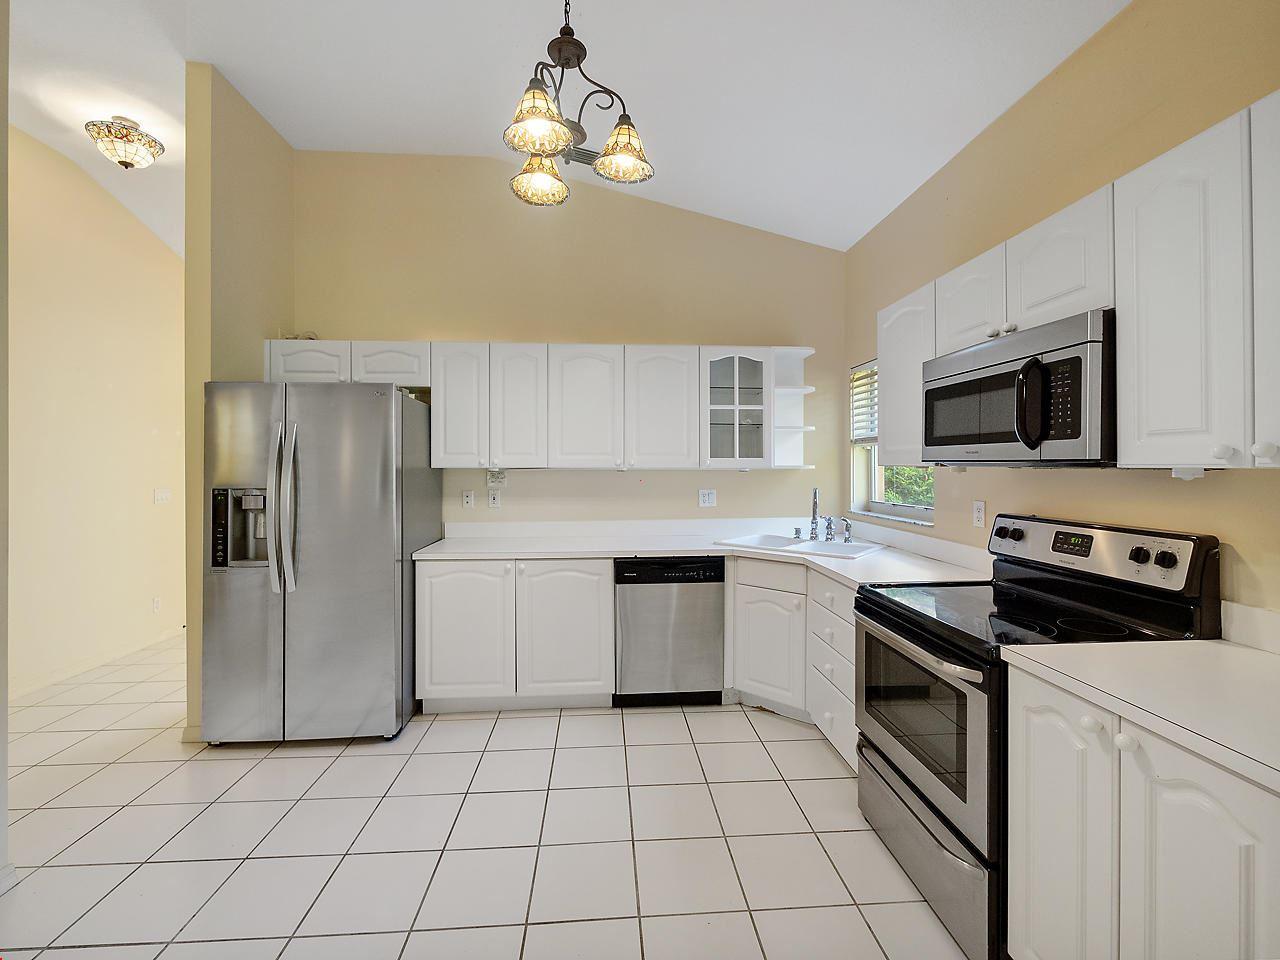 Photo of 8059 Via Hacienda, Riviera Beach, FL 33418 (MLS # RX-10653549)